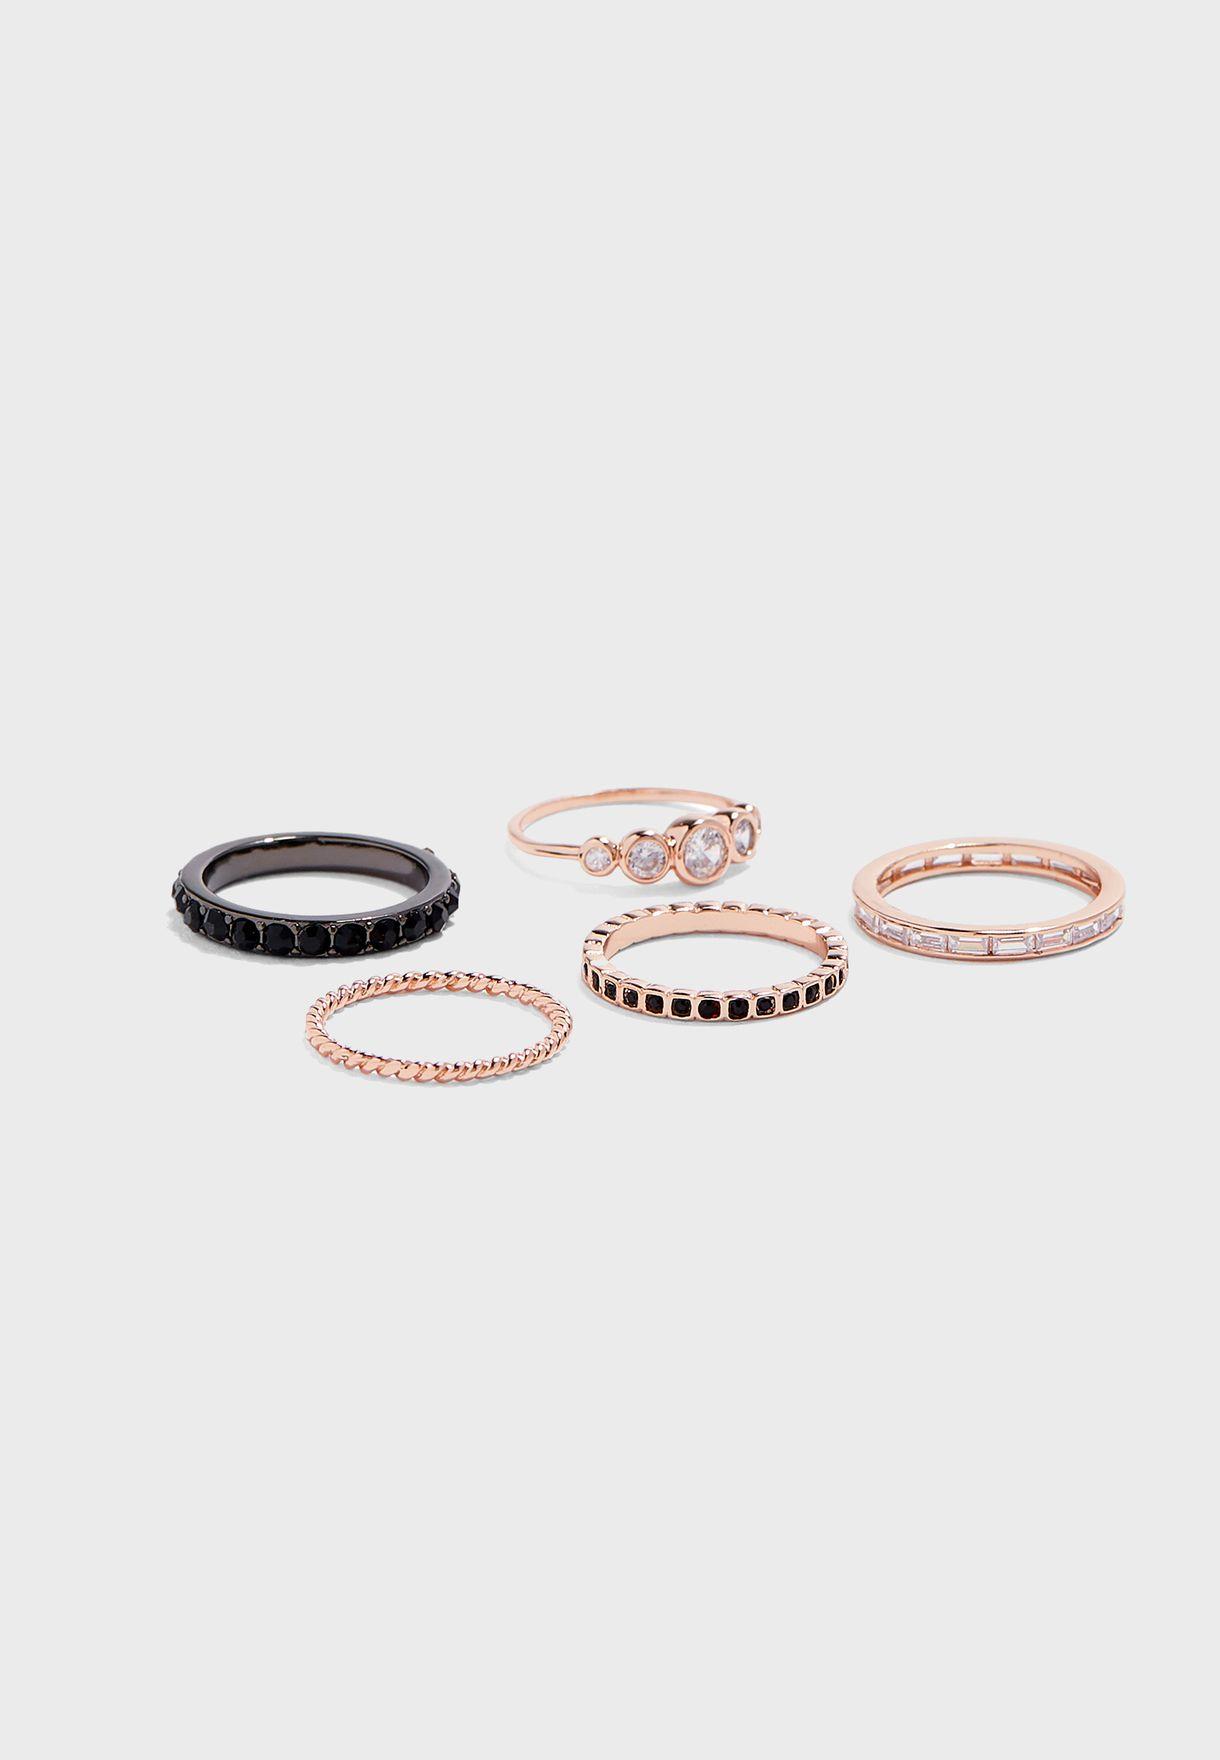 Niacia Ring